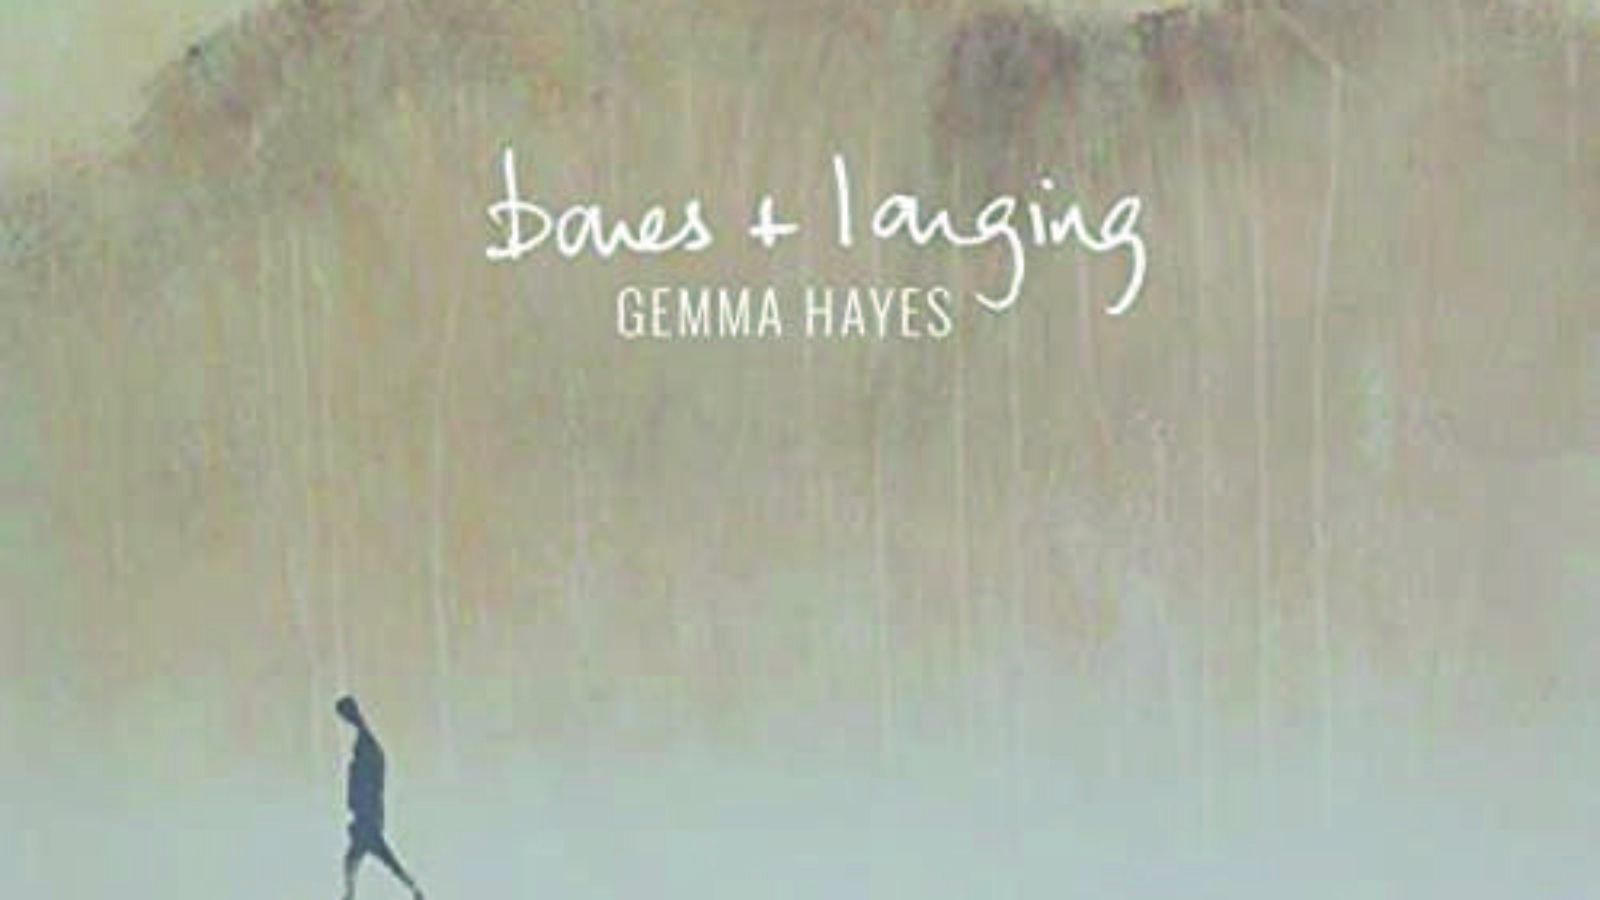 GEMMA HAYES Bones + Longing